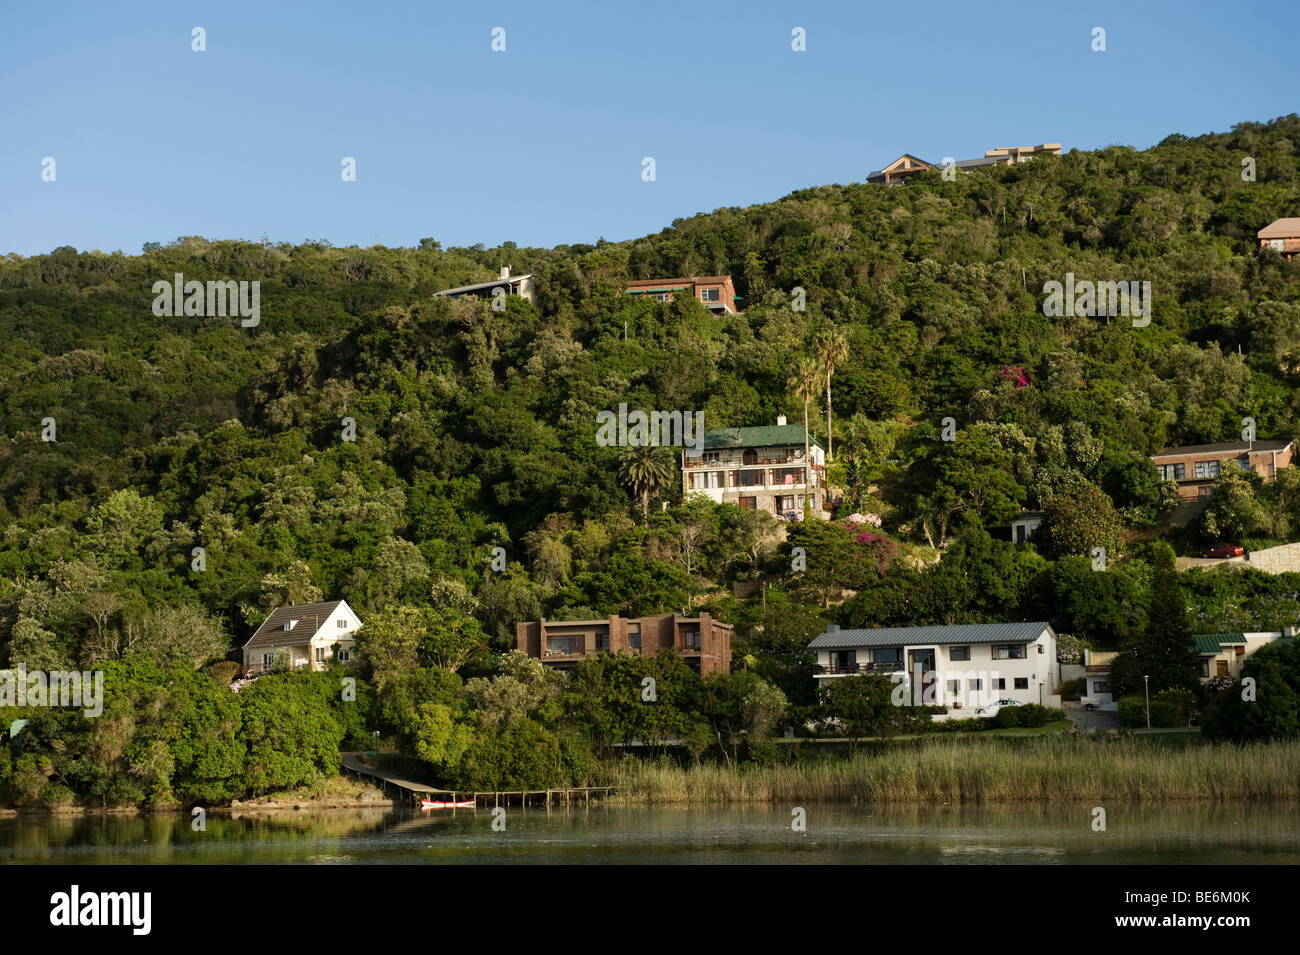 Touw river, Wilderness, Garden Route, South Africa Stock Photo ...